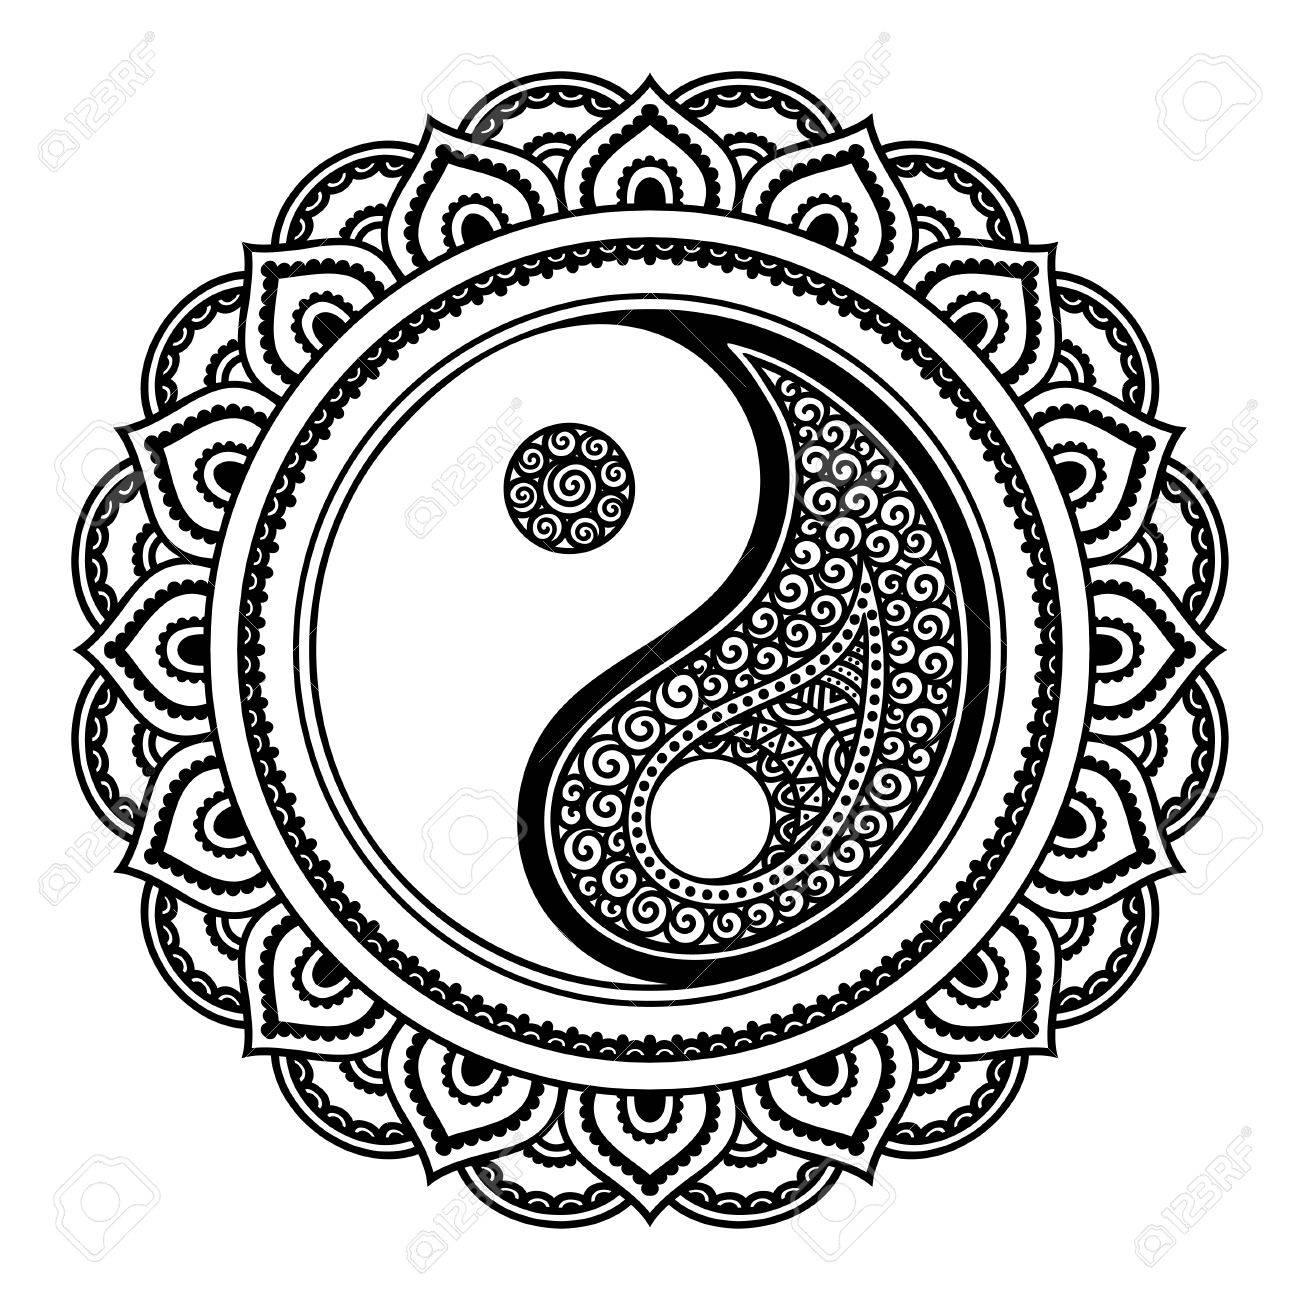 a circular pattern in the form of a mandala yin yang decorative rh 123rf com henna hand designs vector henna hand designs vector